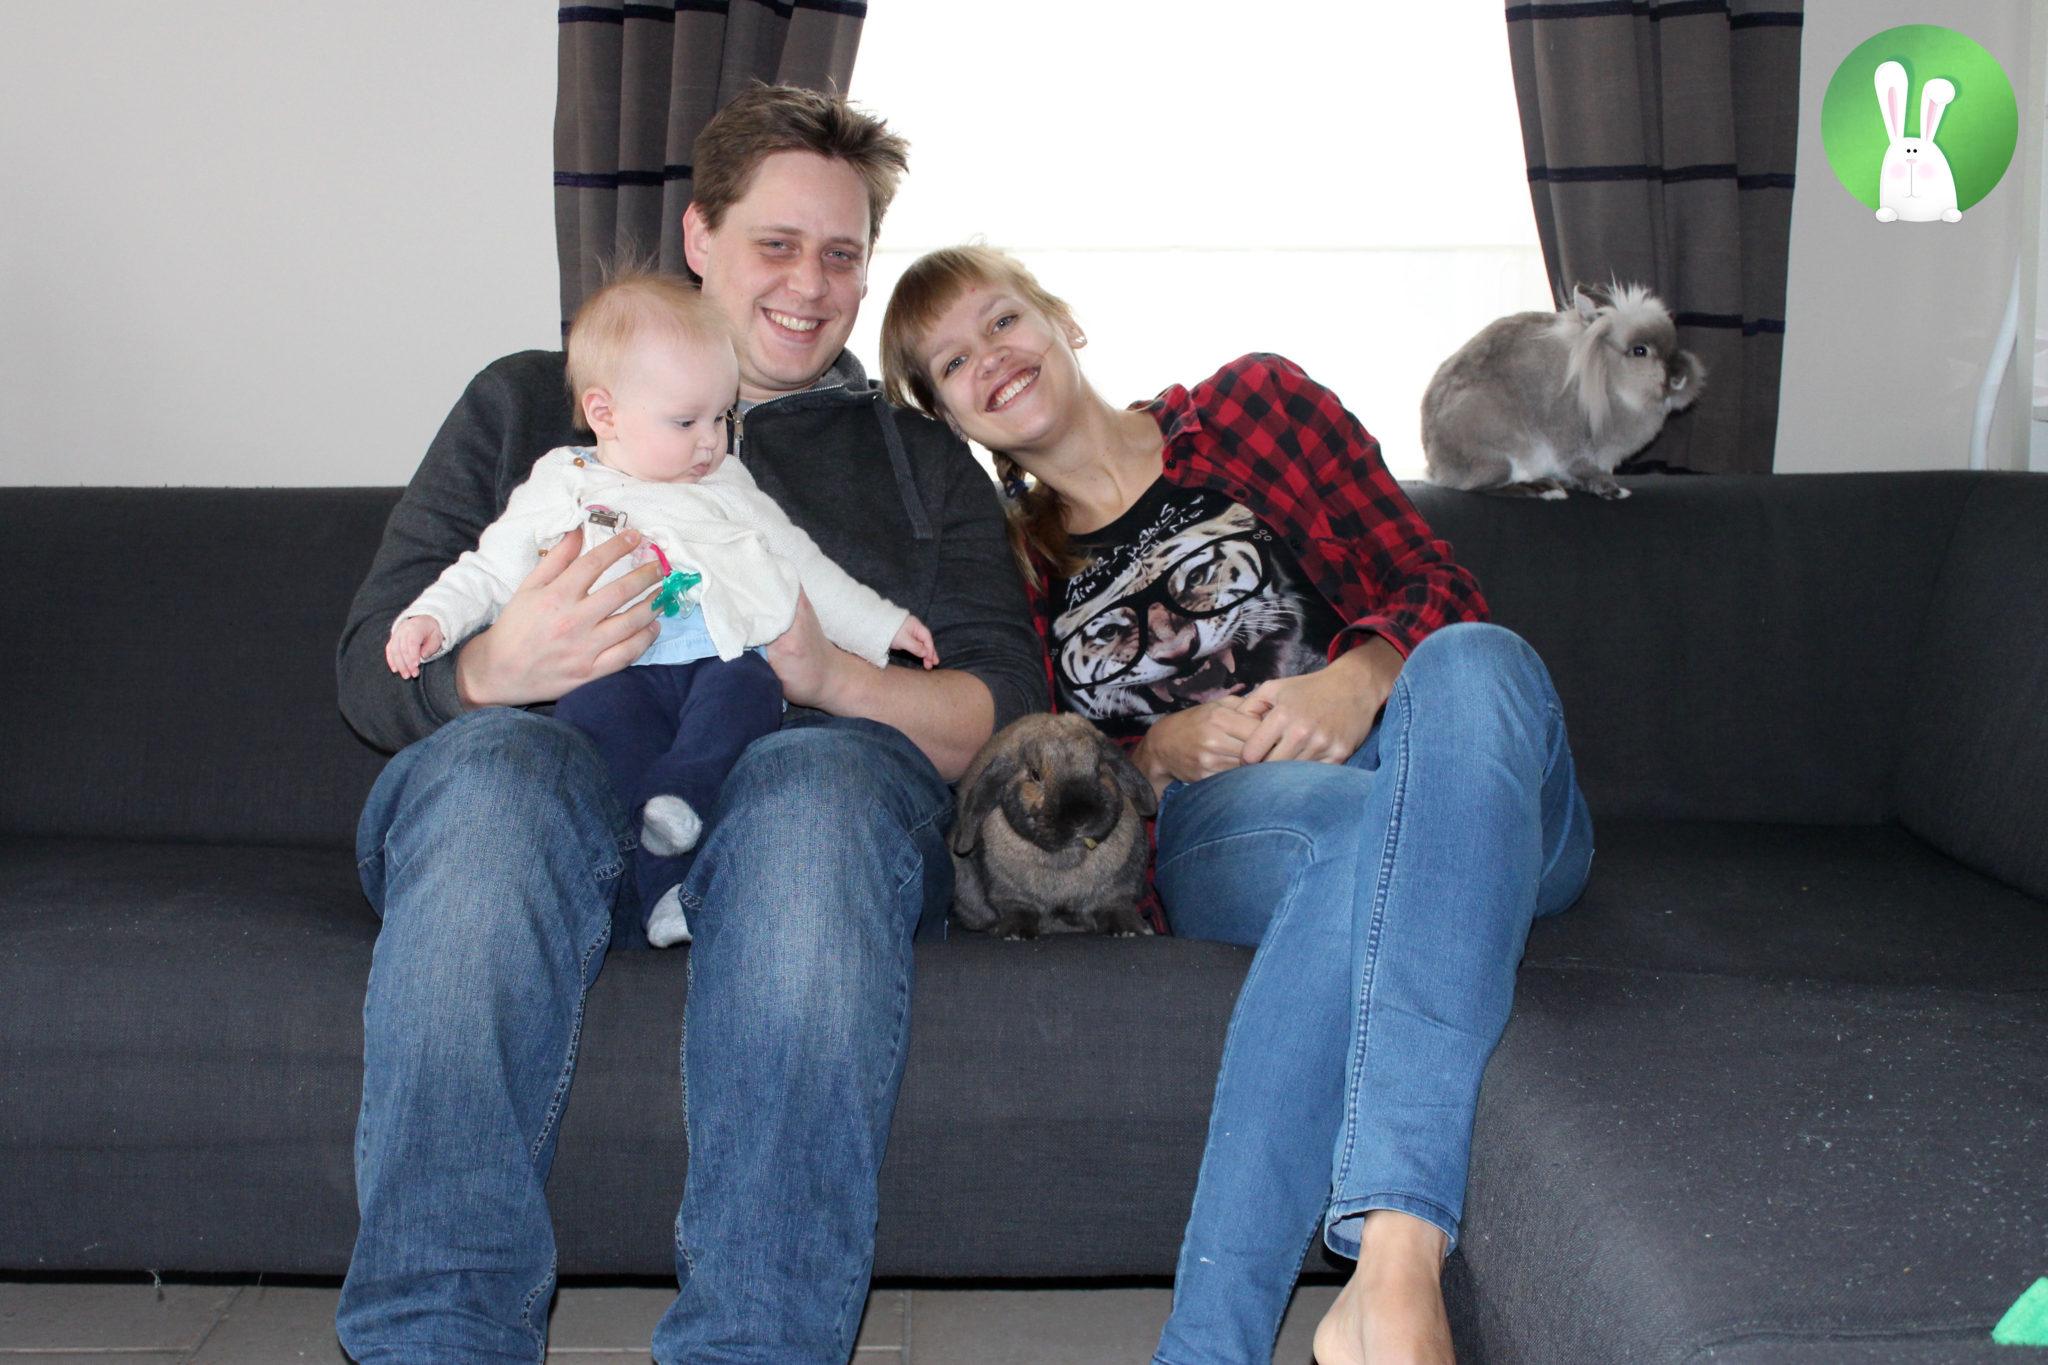 Familieportret | Konijnenadviesbureau Hopster